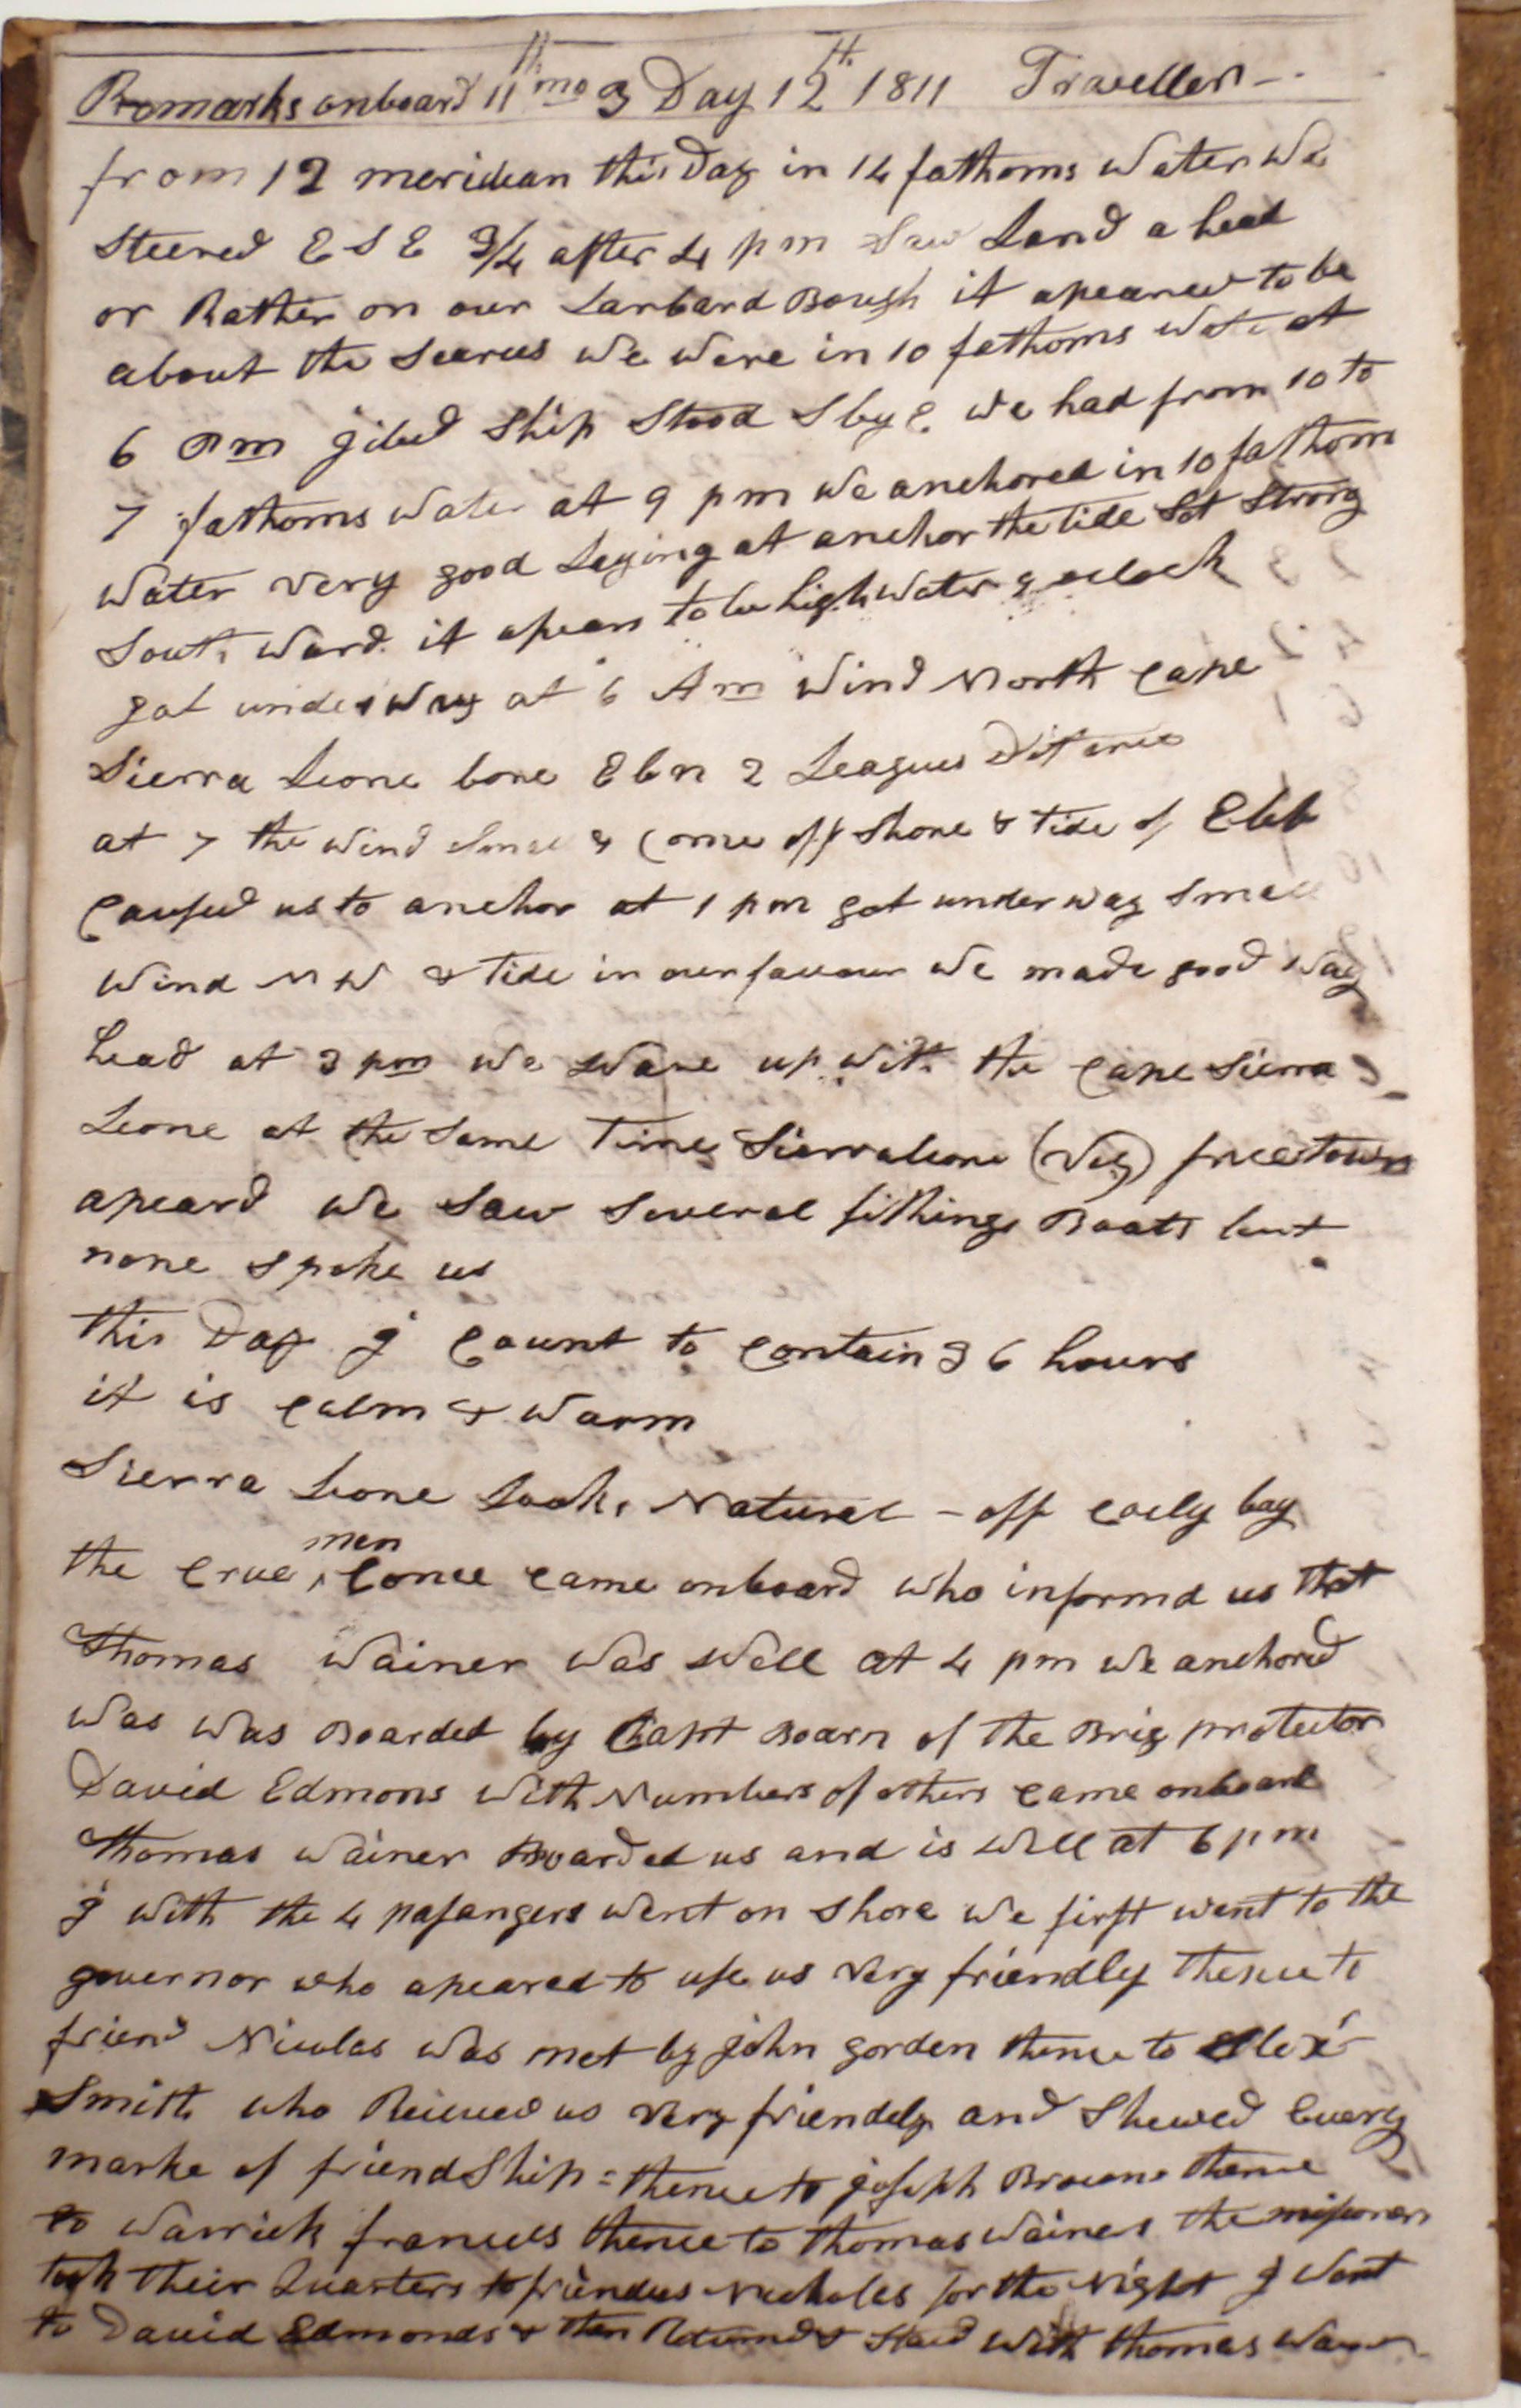 Traveller log book, 12 Nov 1811 (Cuffe Papers, NBFPL)